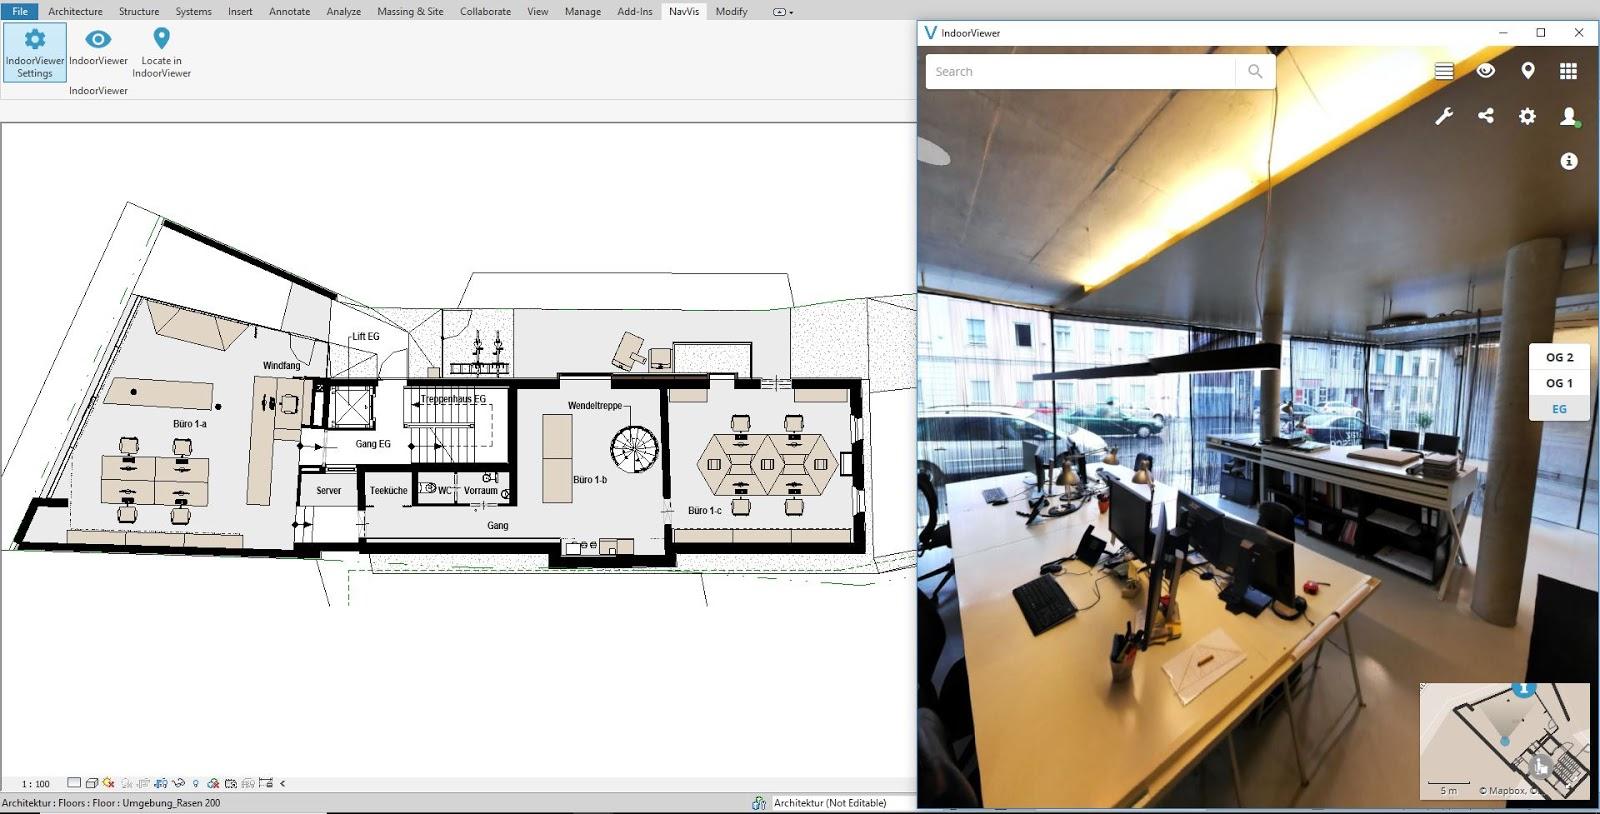 Revit Add-Ons: NavVis IndoorViewer Add-In for Autodesk® Revit®